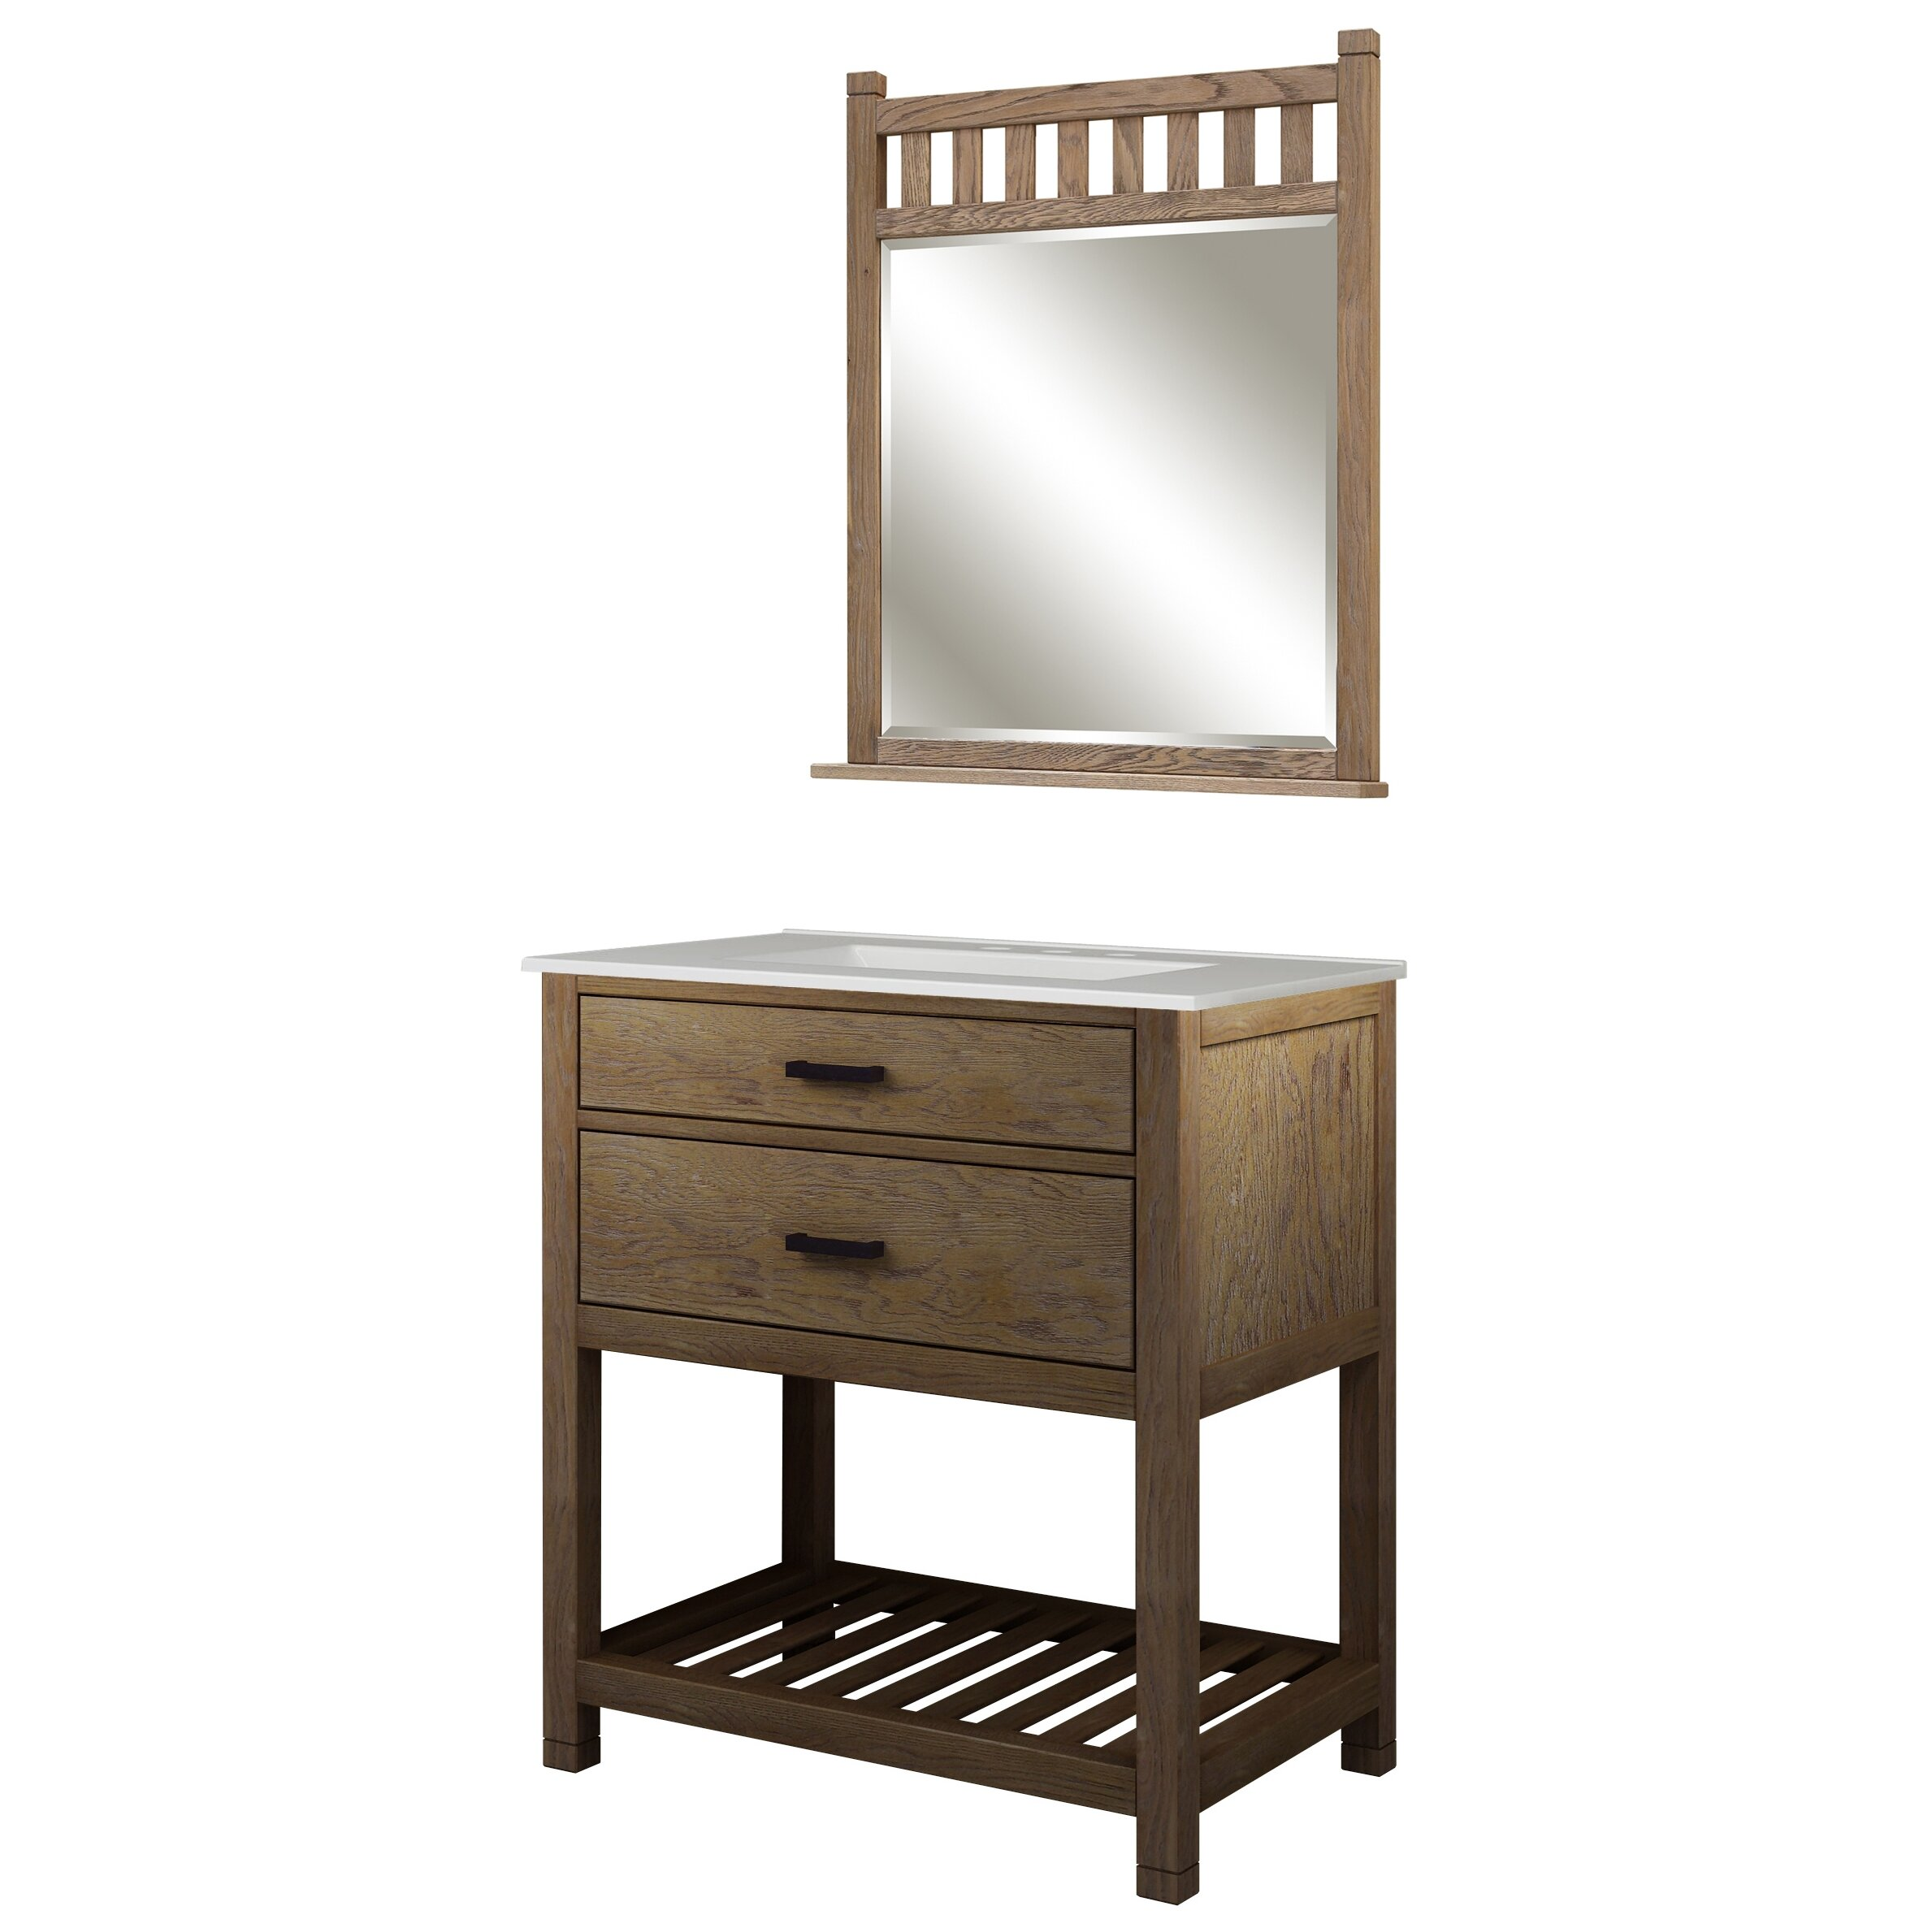 Sagehill toby 31 single bathroom vanity set with for Sagehill designs bathroom vanity